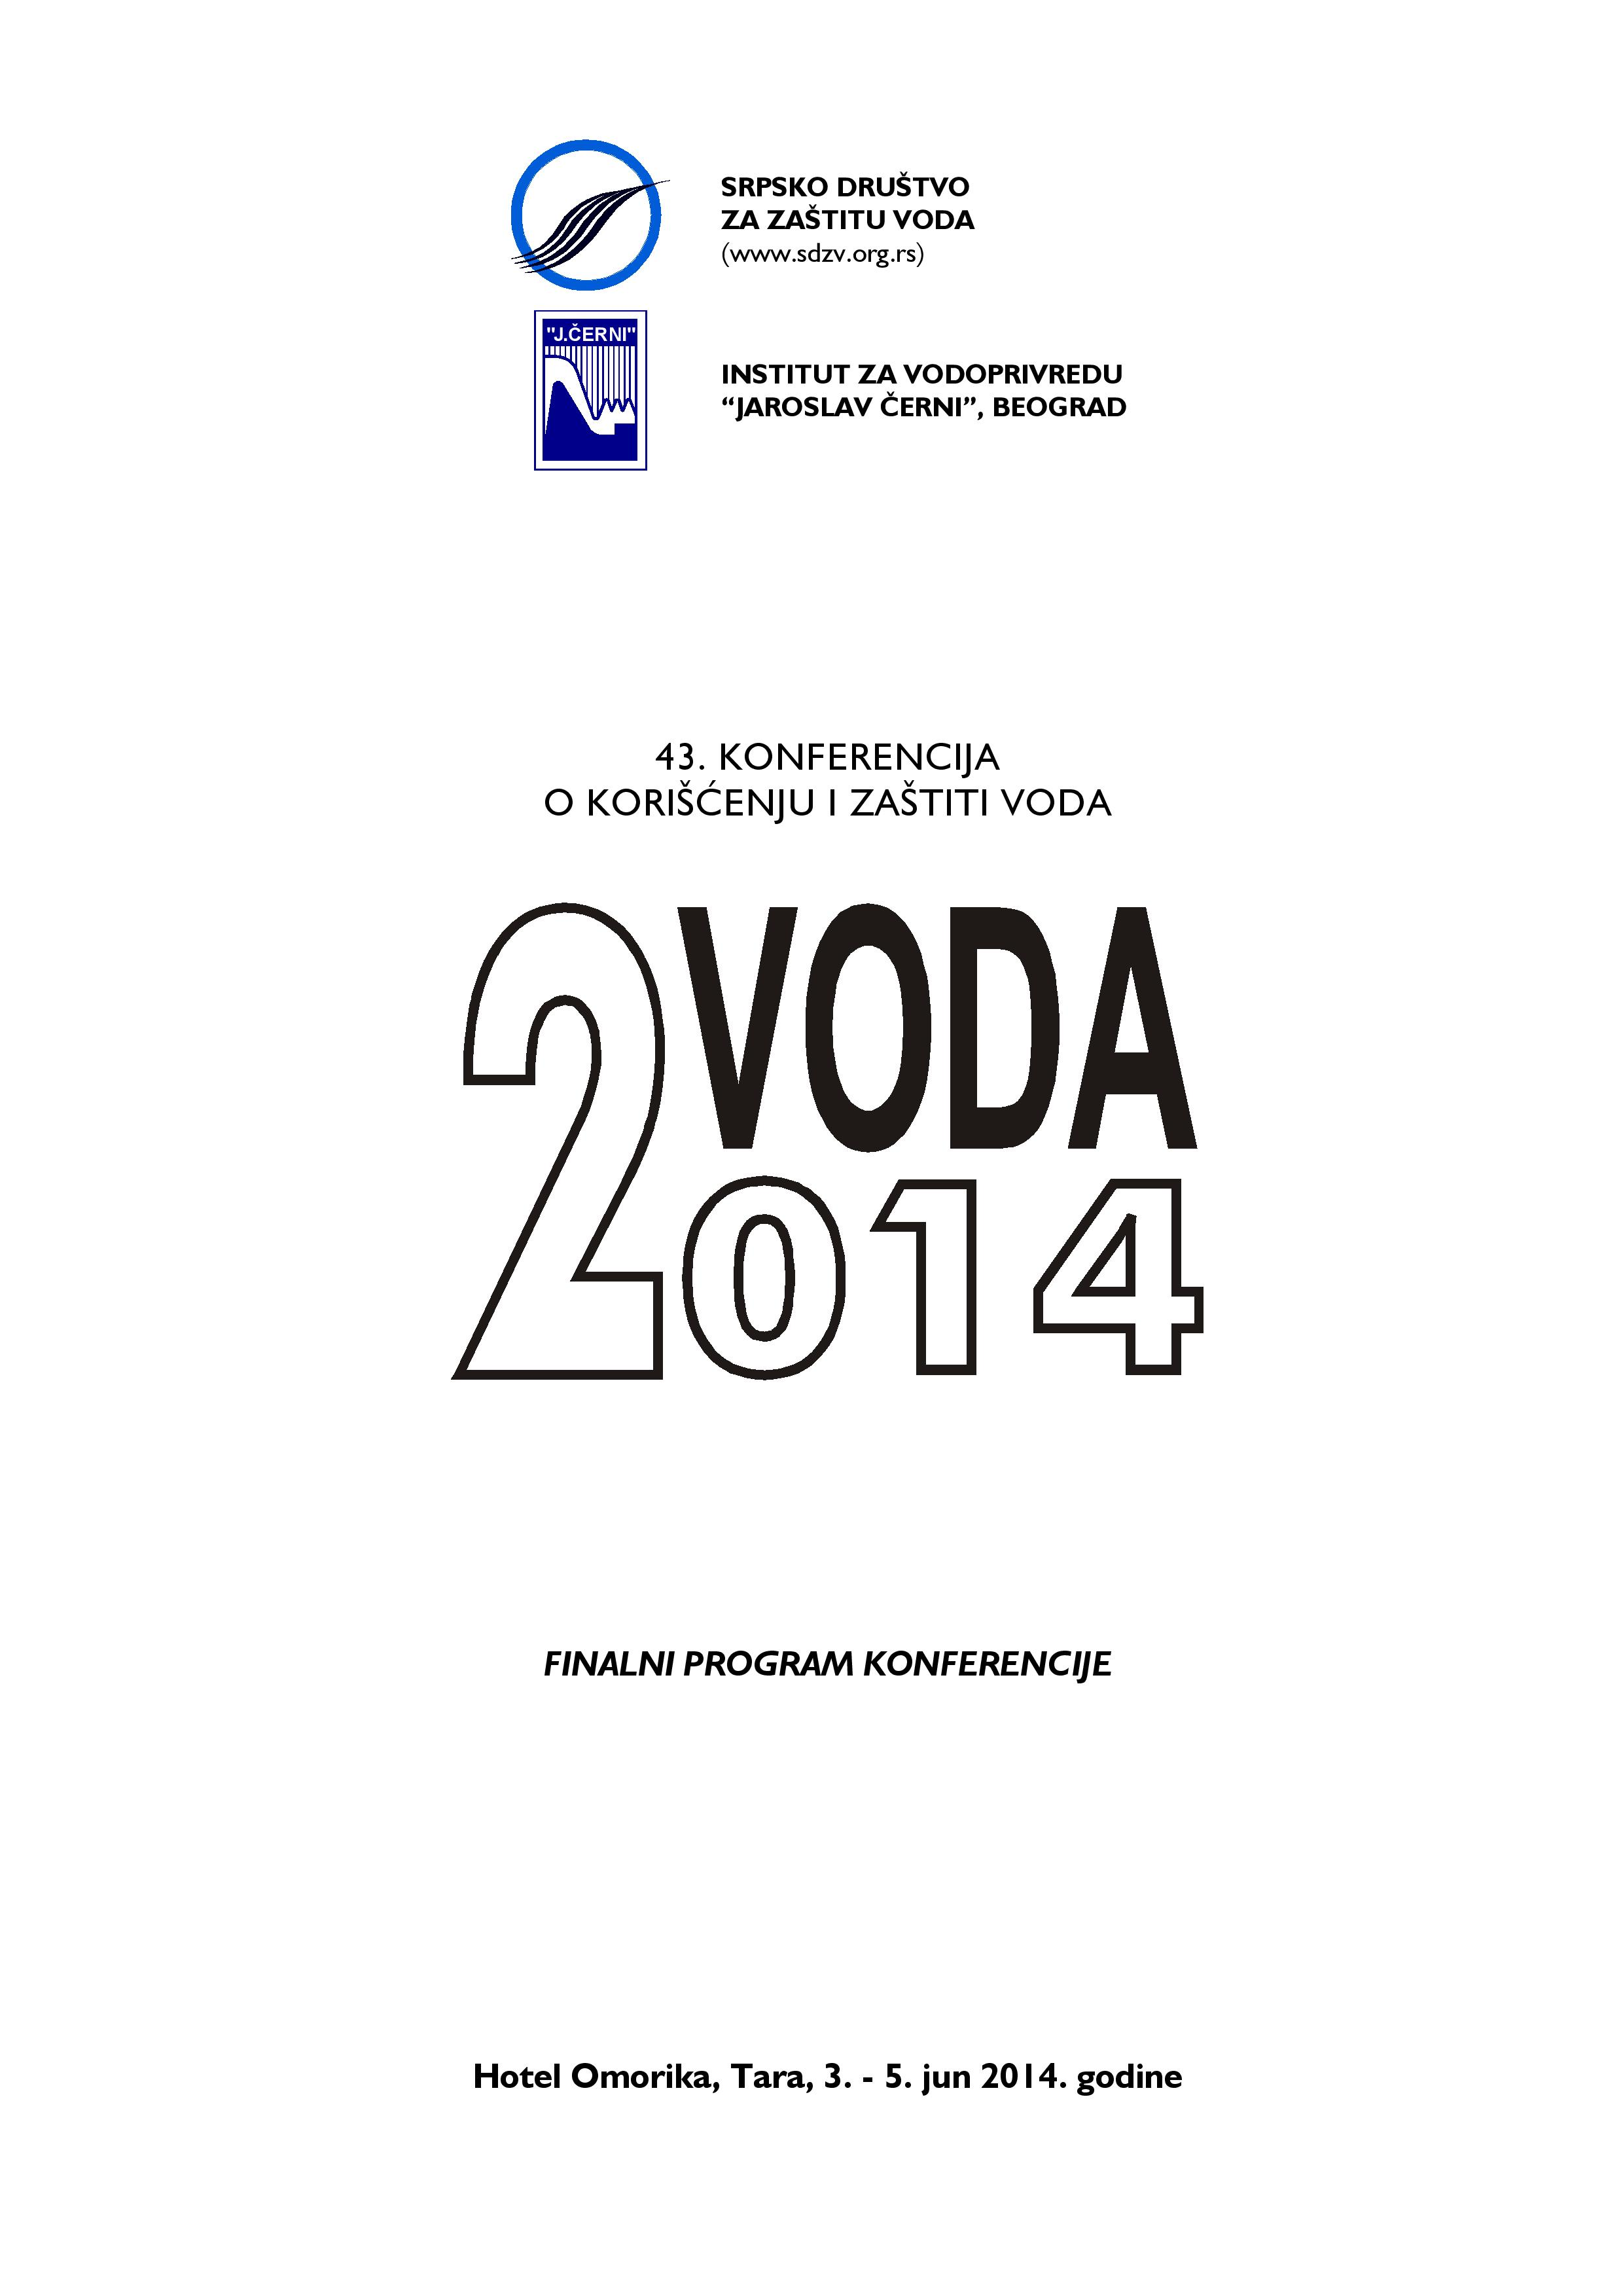 Konferencija_VODA_2014_-_Final_Program_i_prijave-page-001.jpg